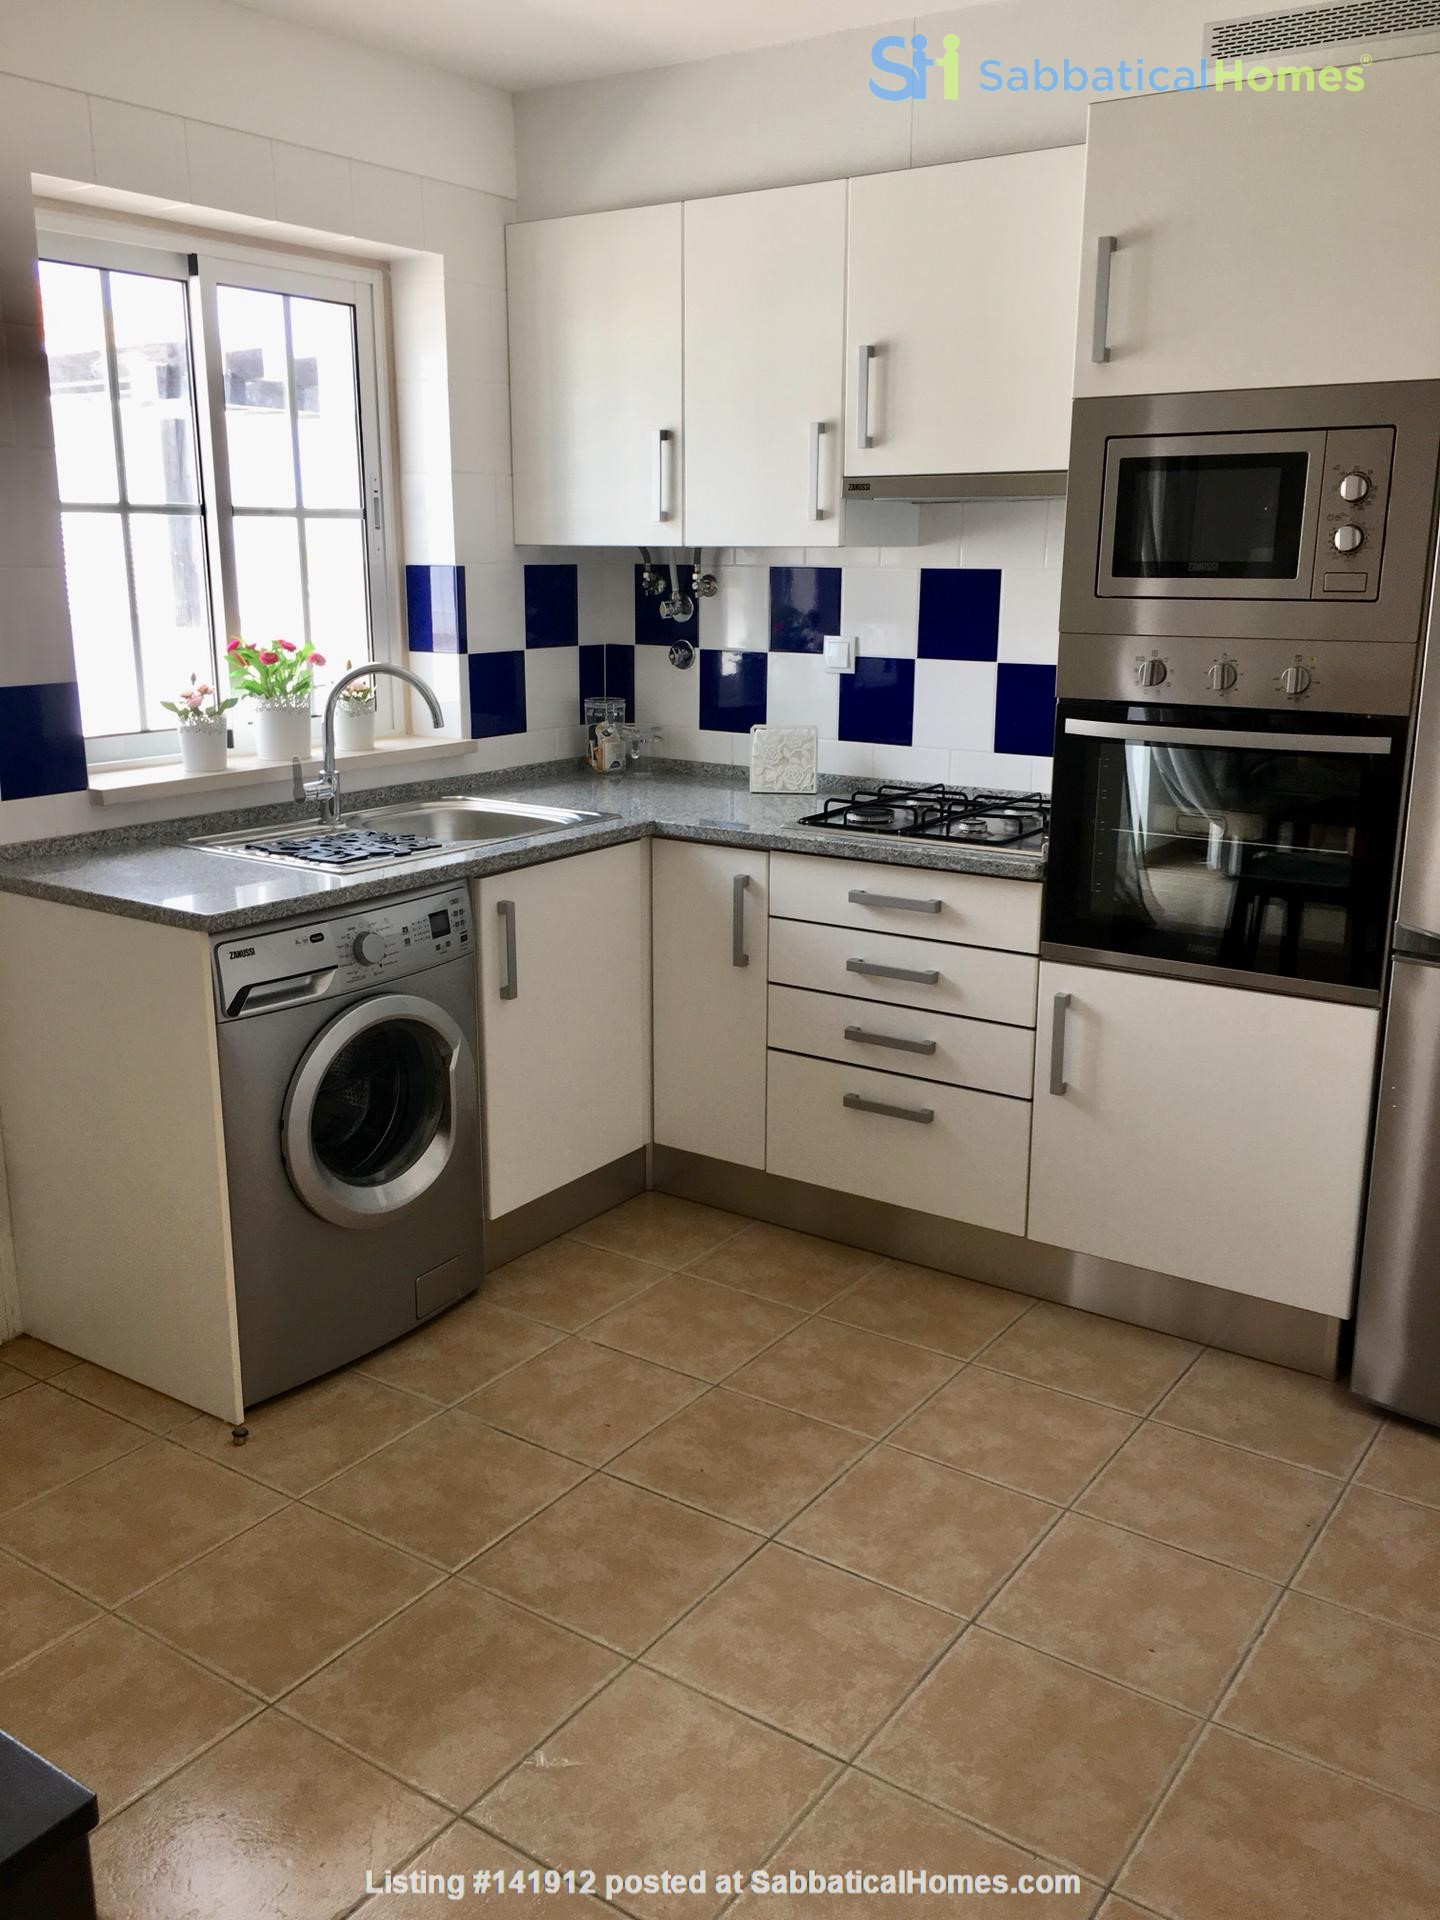 SUNNY ALGARVE PORTUGAL - 2 apartments available Home Rental in Tavira, Faro District, Portugal 3